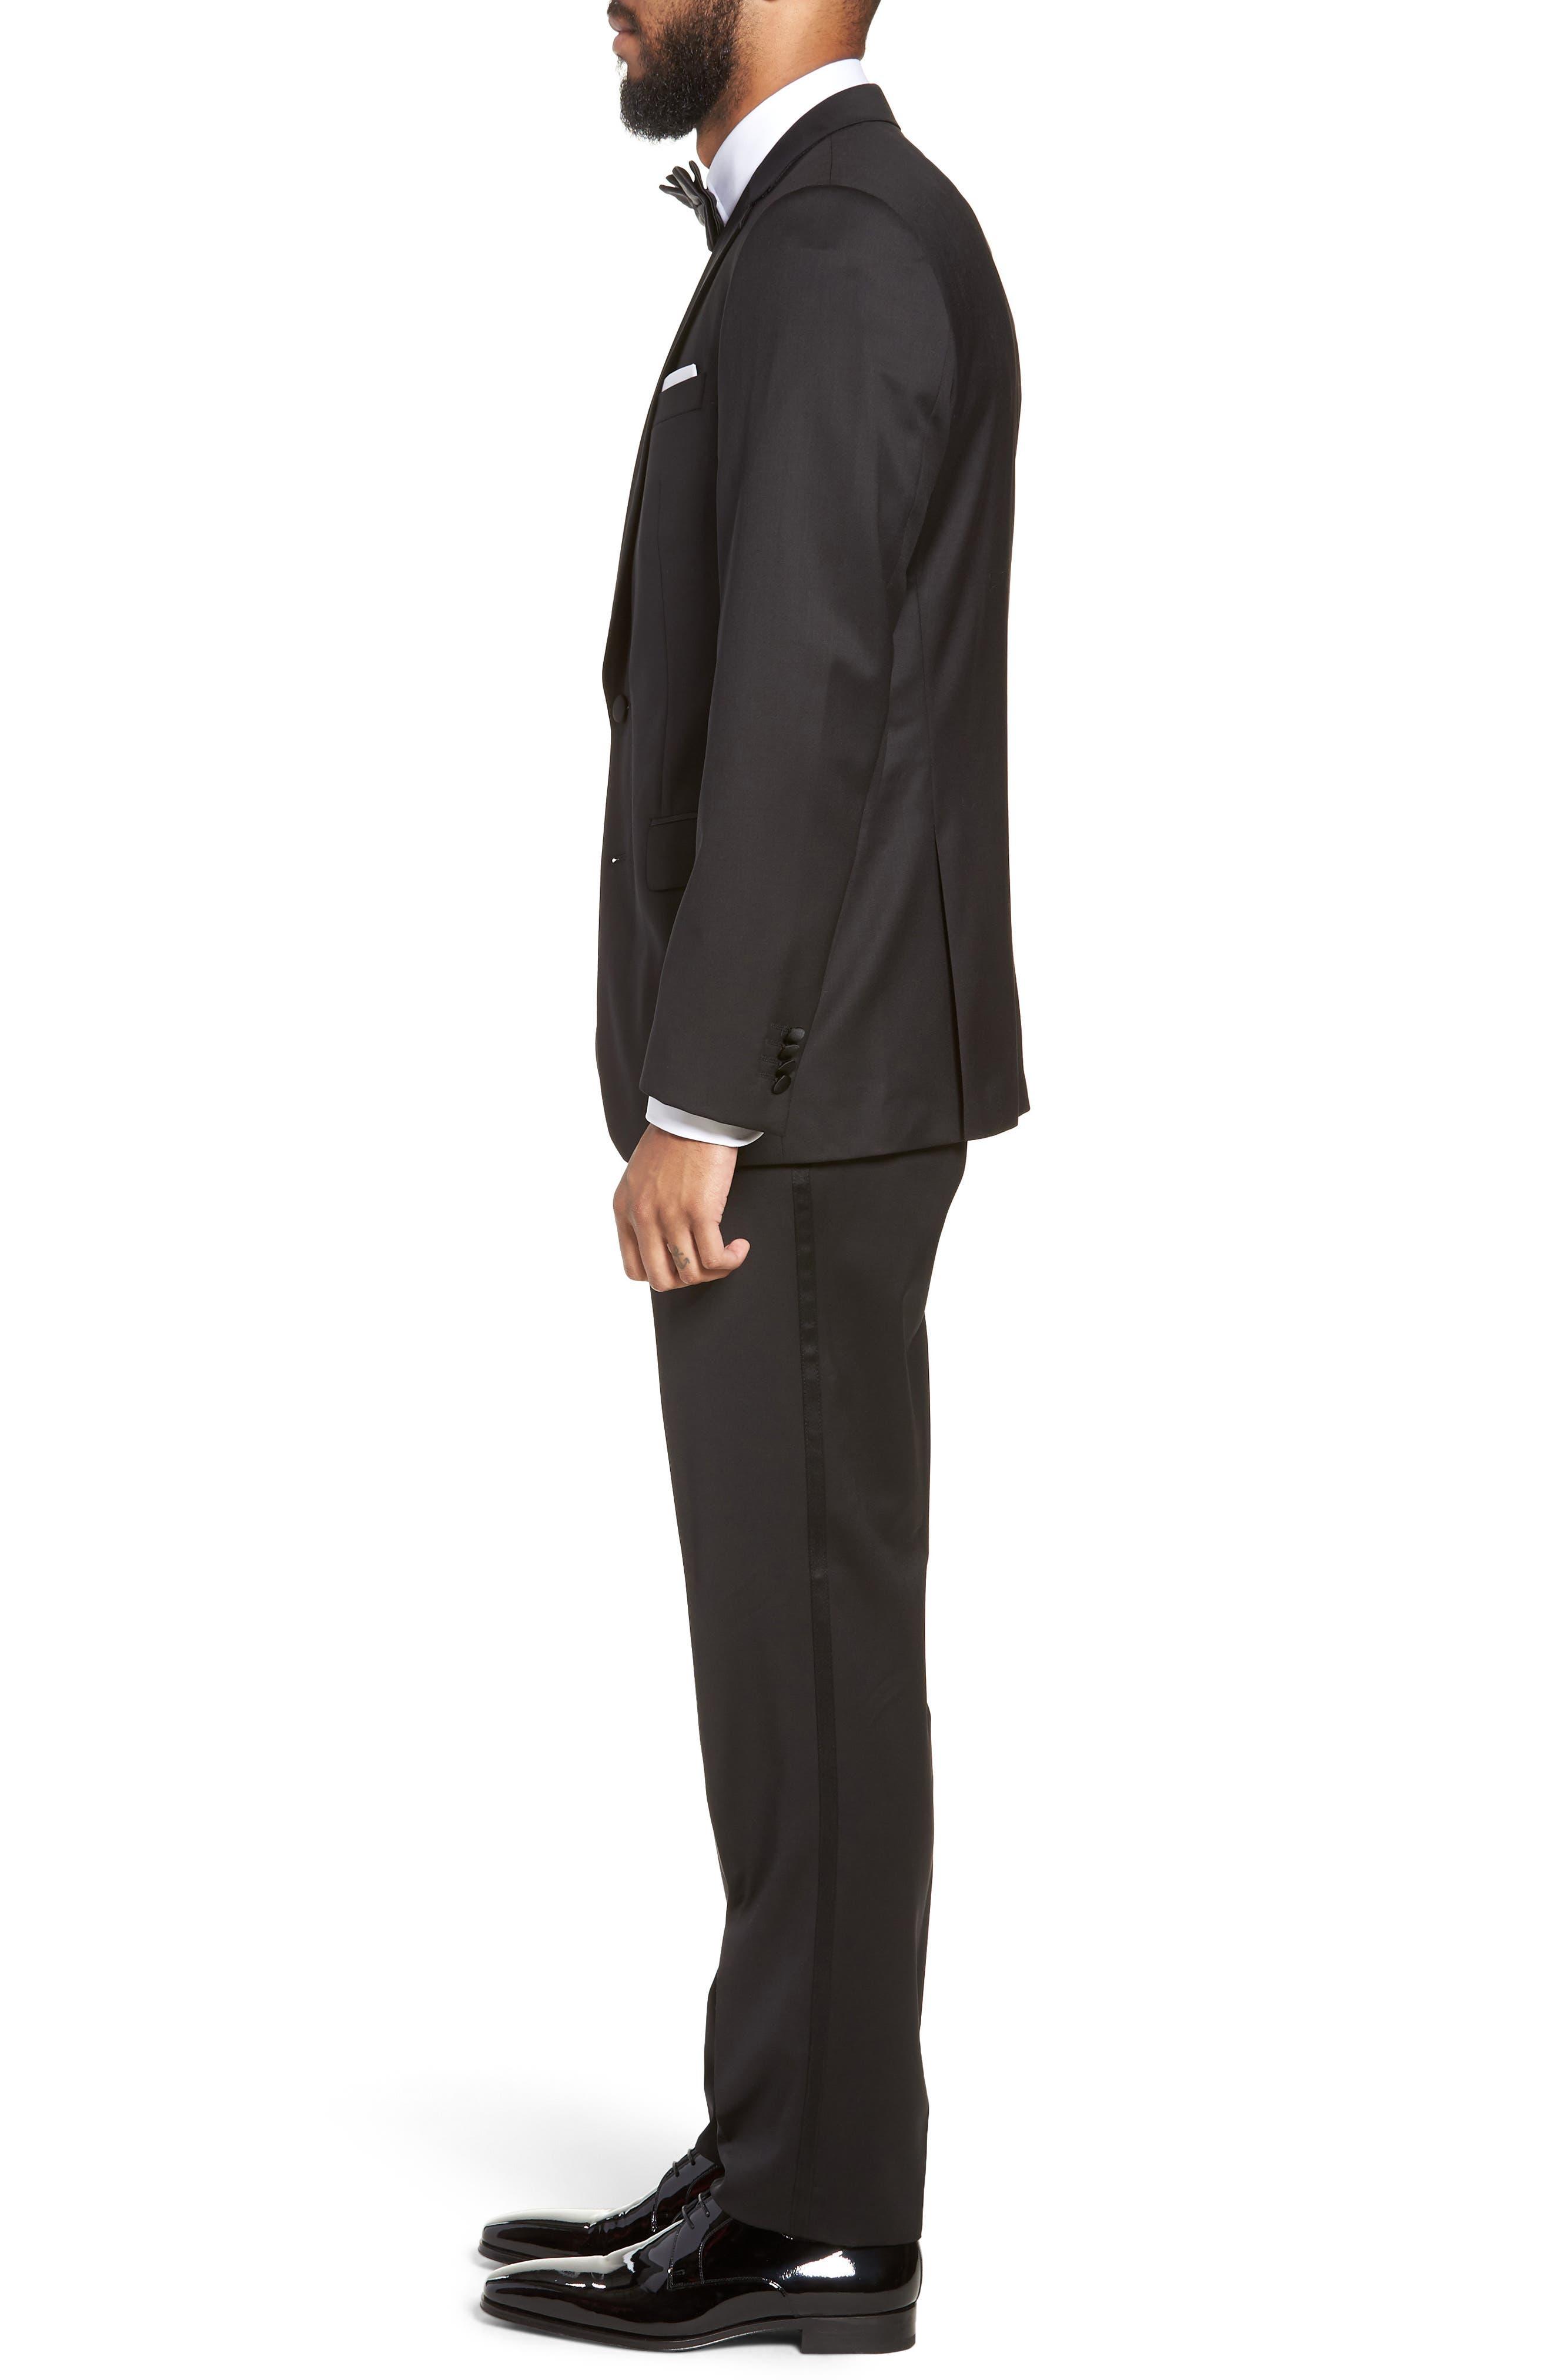 Halven/Gentry Trim Fit Wool Tuxedo,                             Alternate thumbnail 3, color,                             BLACK